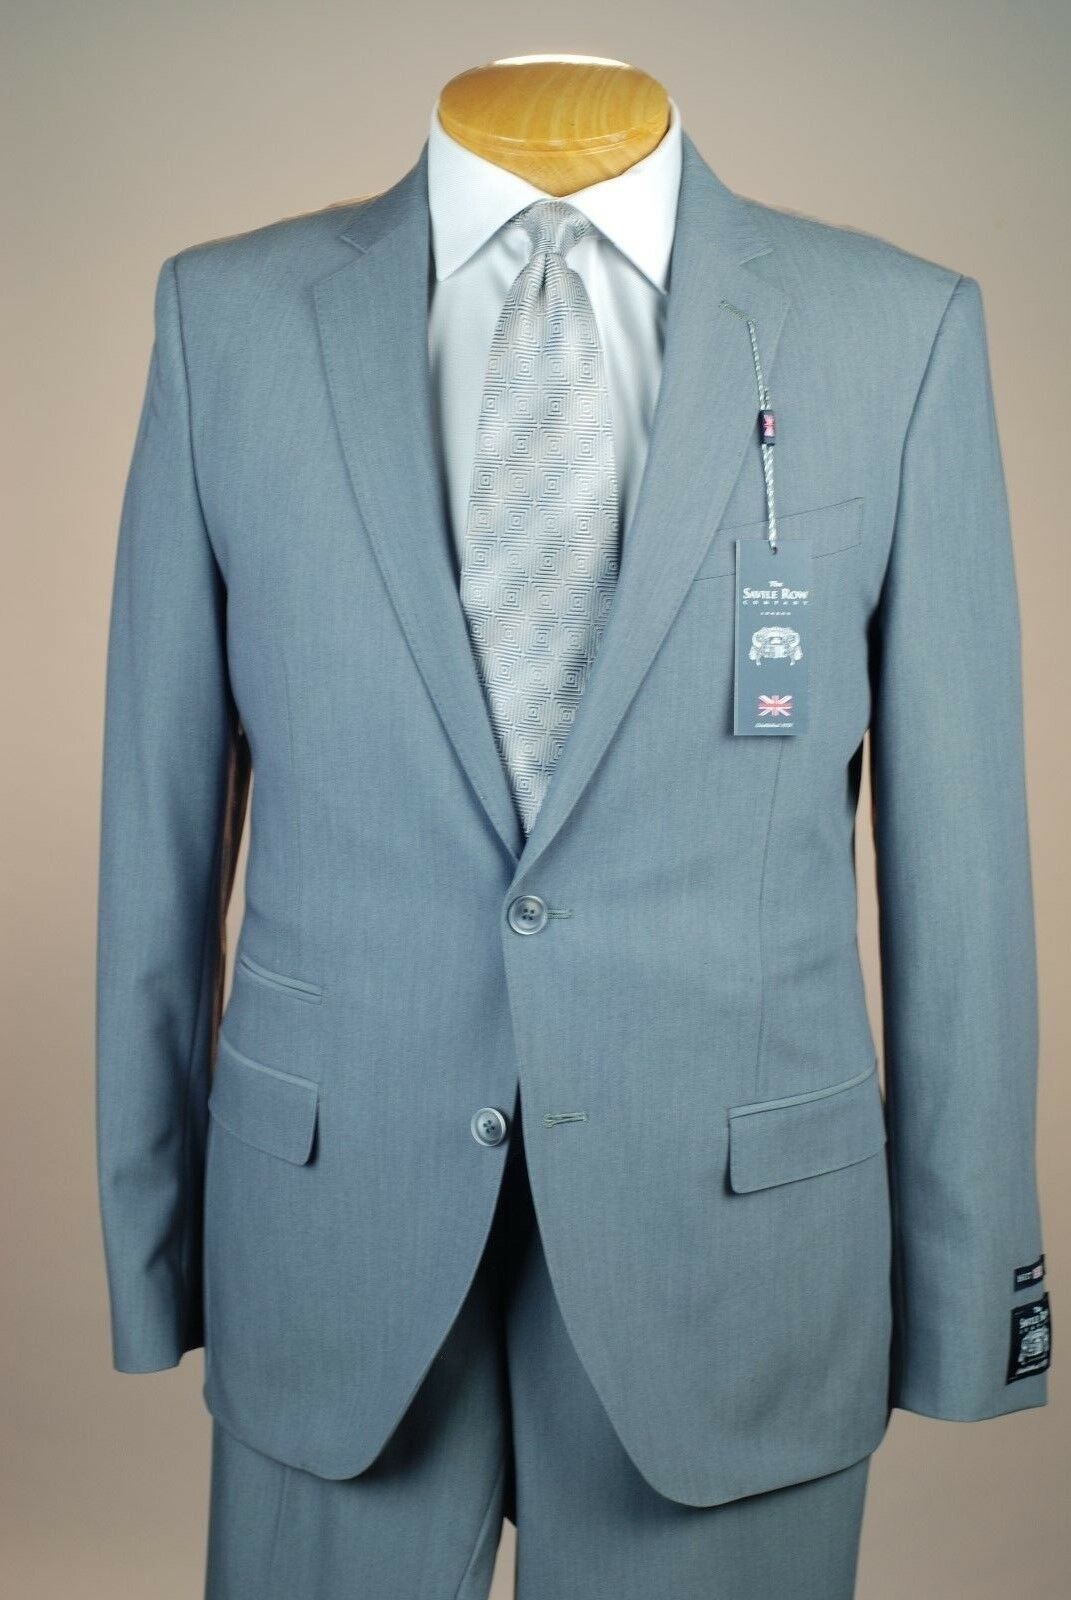 42L SAVILE ROW Solid grigio SUIT SEPARATE  42 Long Long Long Uomo Suits - SS43 530d4d